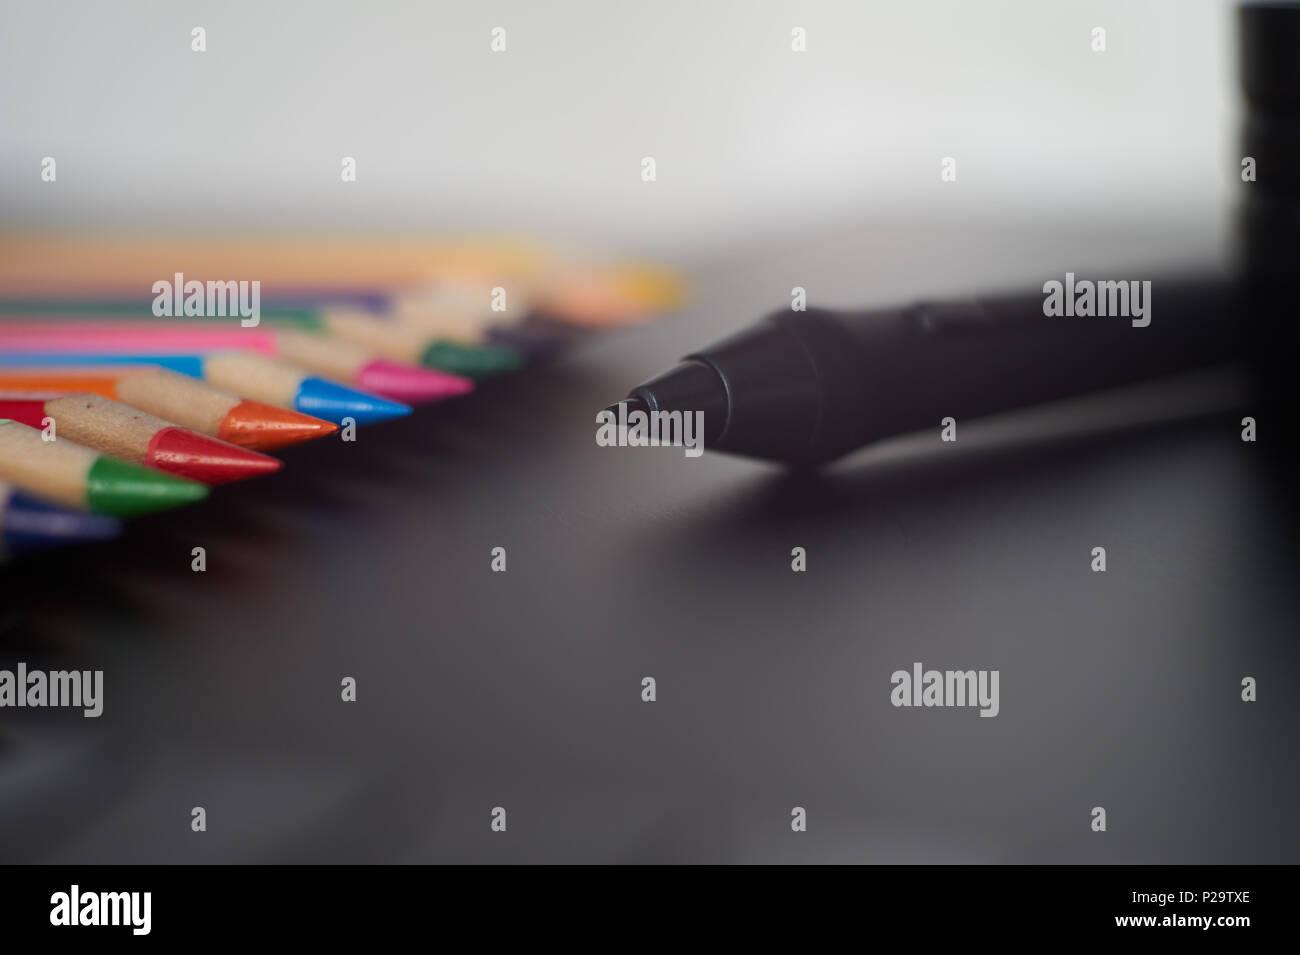 digital stylus pen on digital graphic tablet for illustrators and